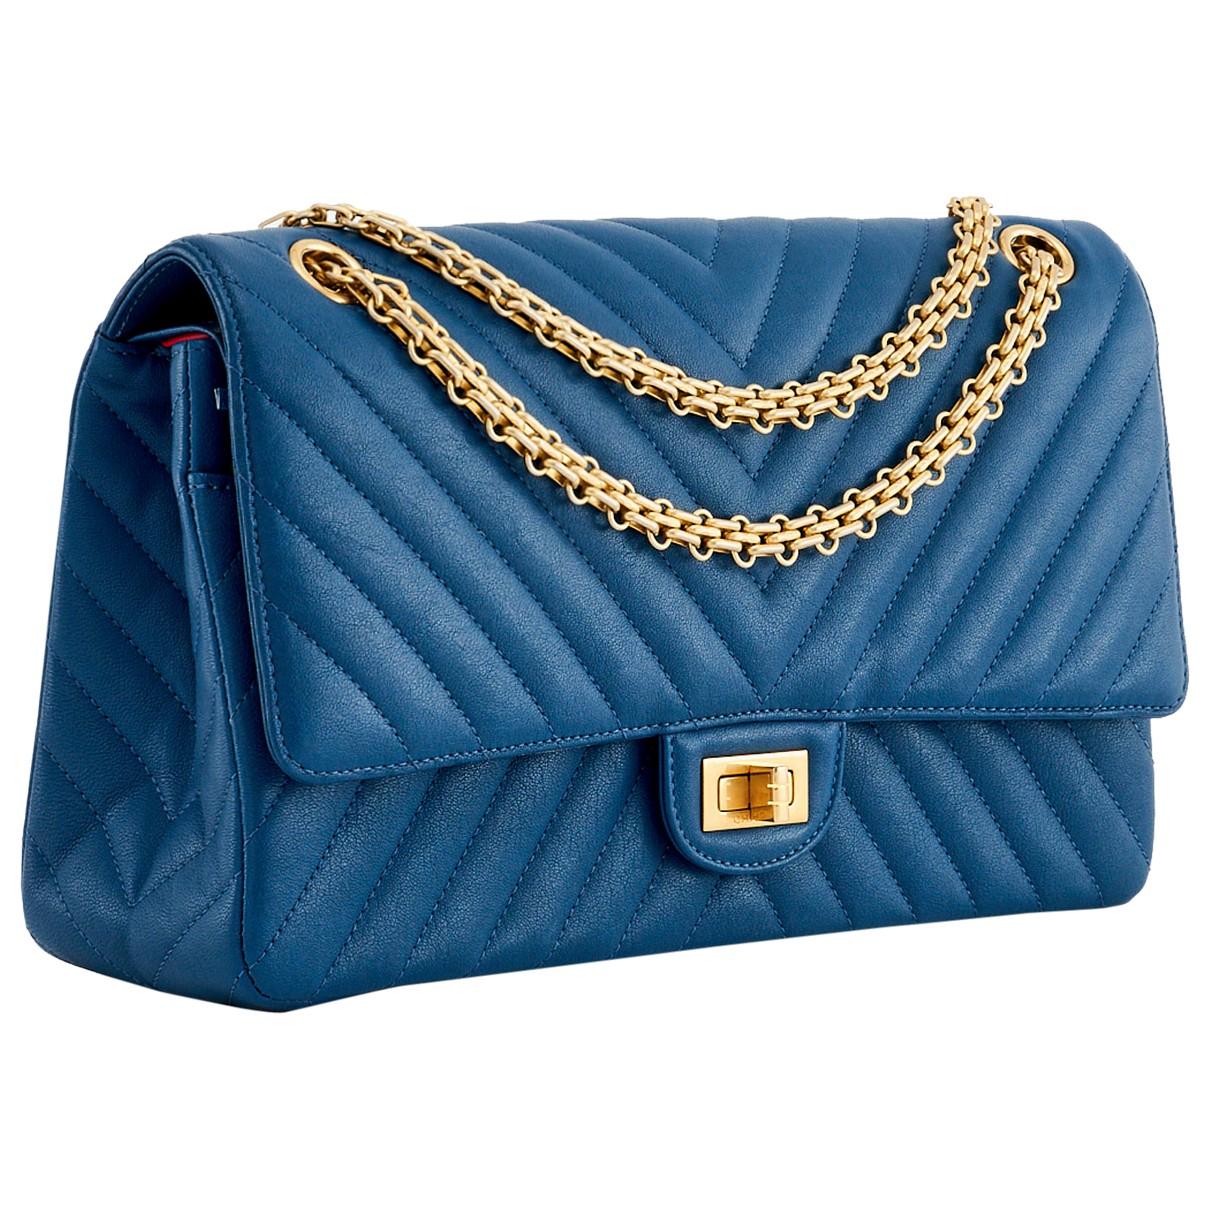 Chanel - Sac a main 2.55 pour femme en cuir - bleu